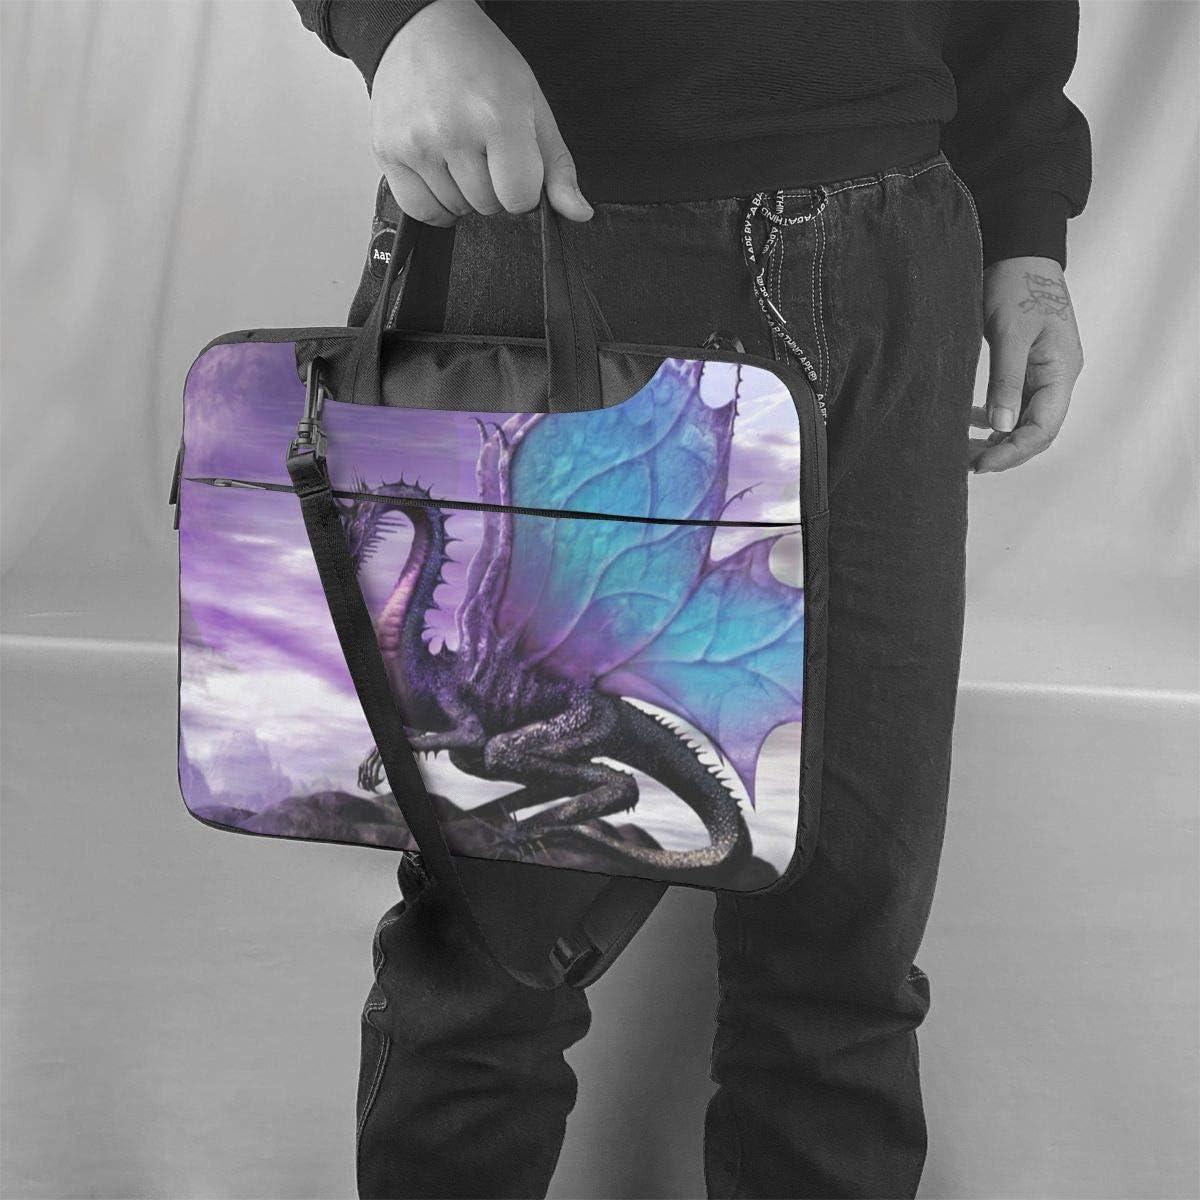 Purple Dragon Purple Moon Printed Laptop Shoulder Bag,Laptop case Handbag Business Messenger Bag Briefcase